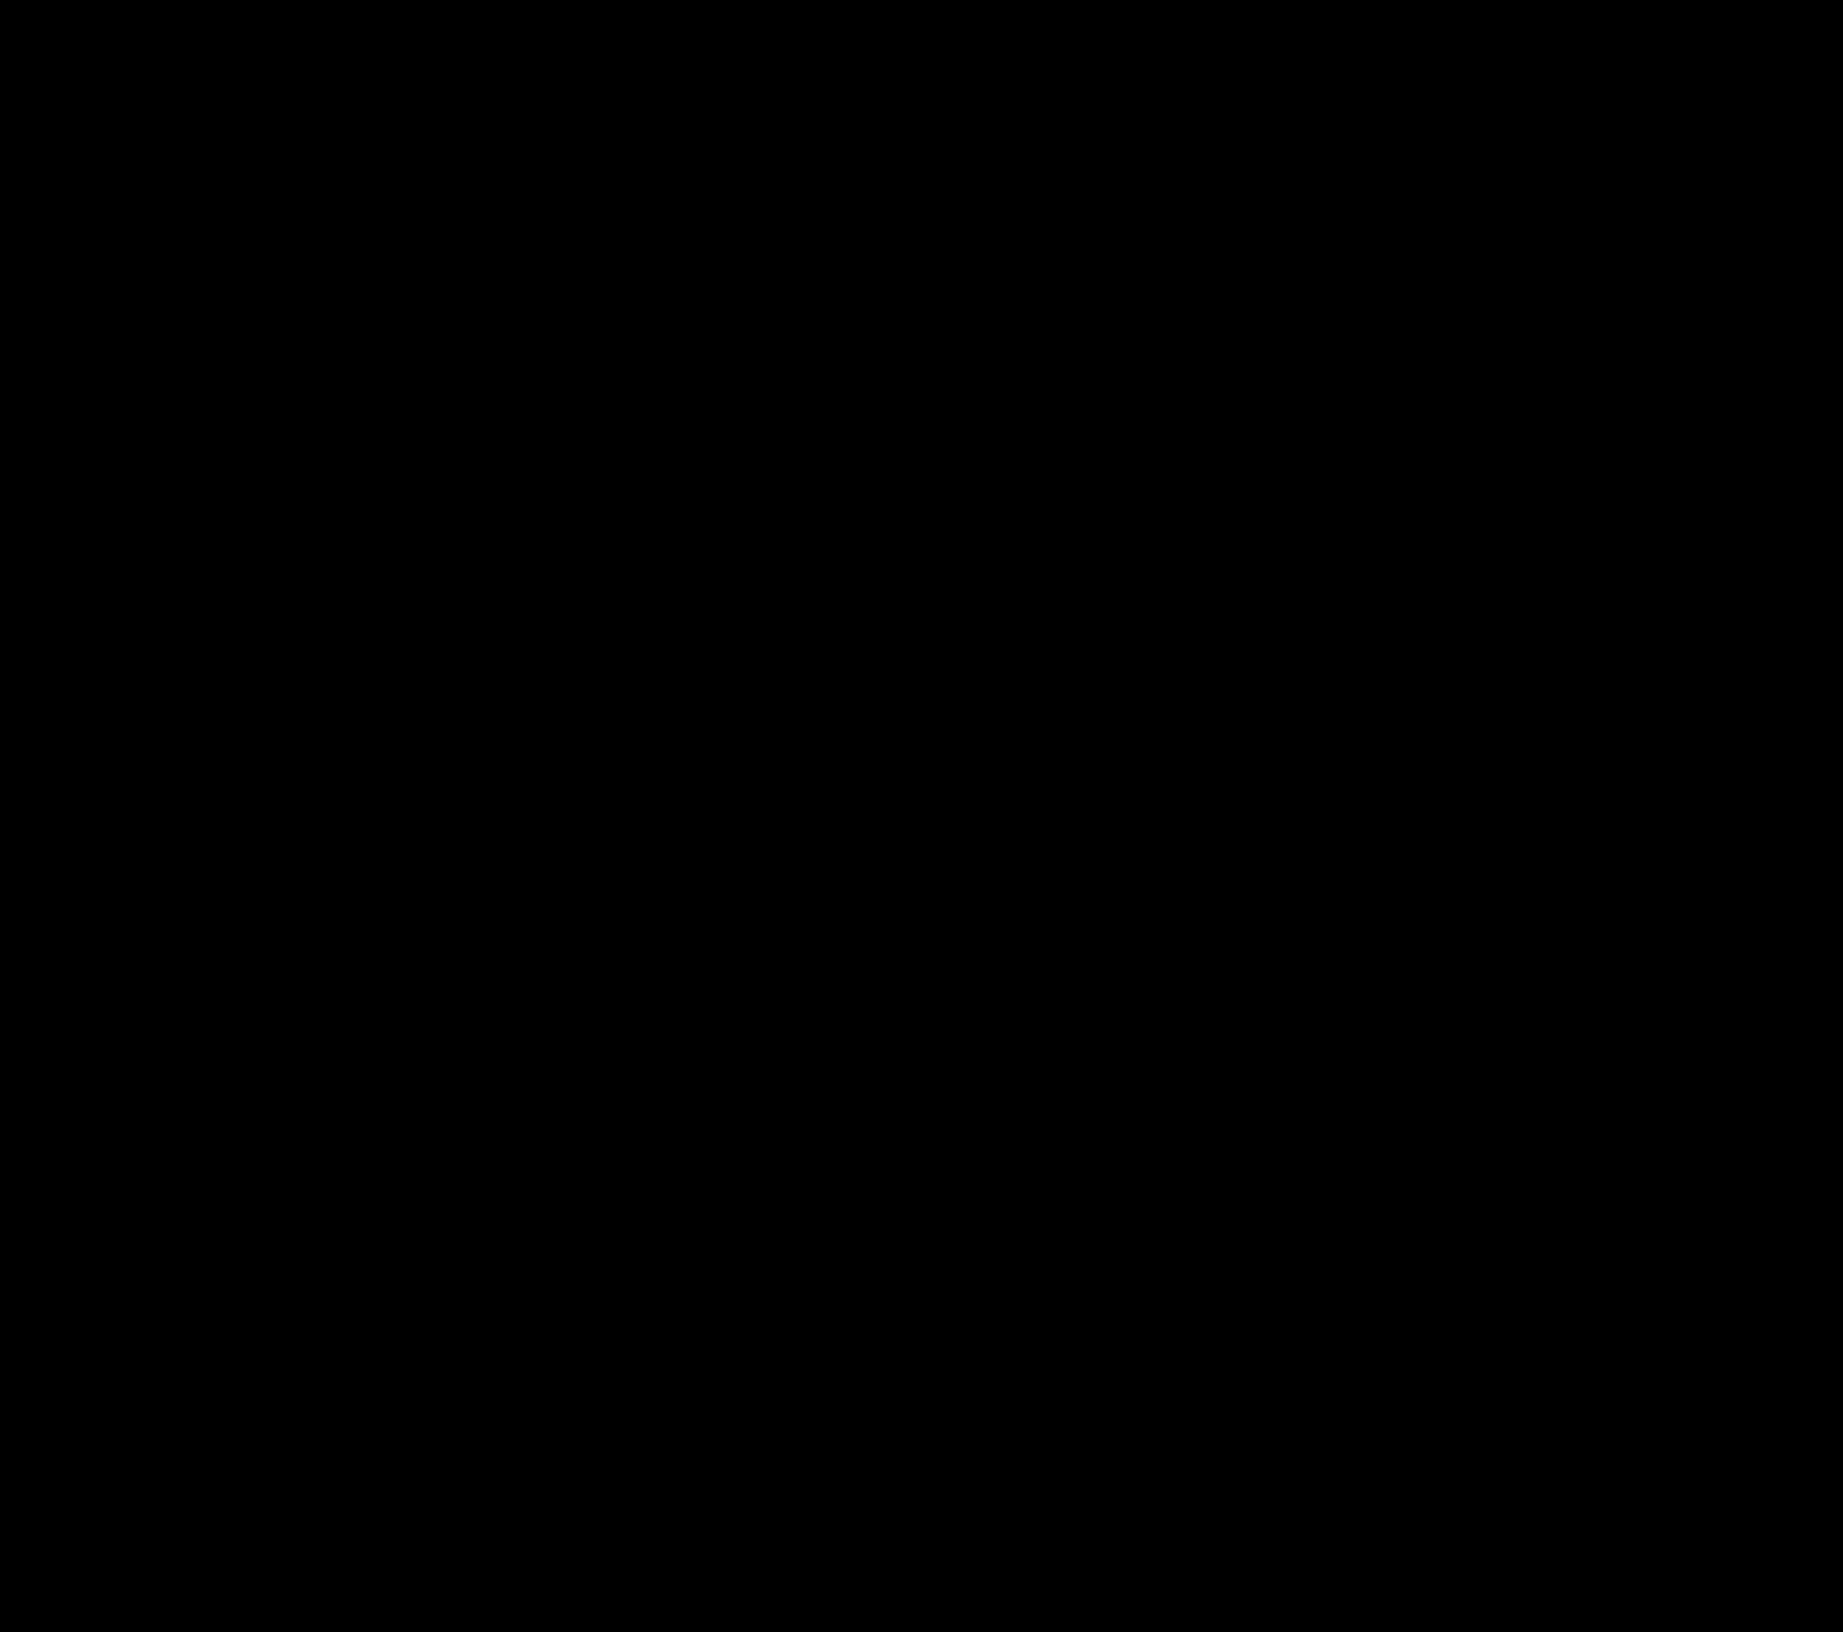 1843x1632 Clipart